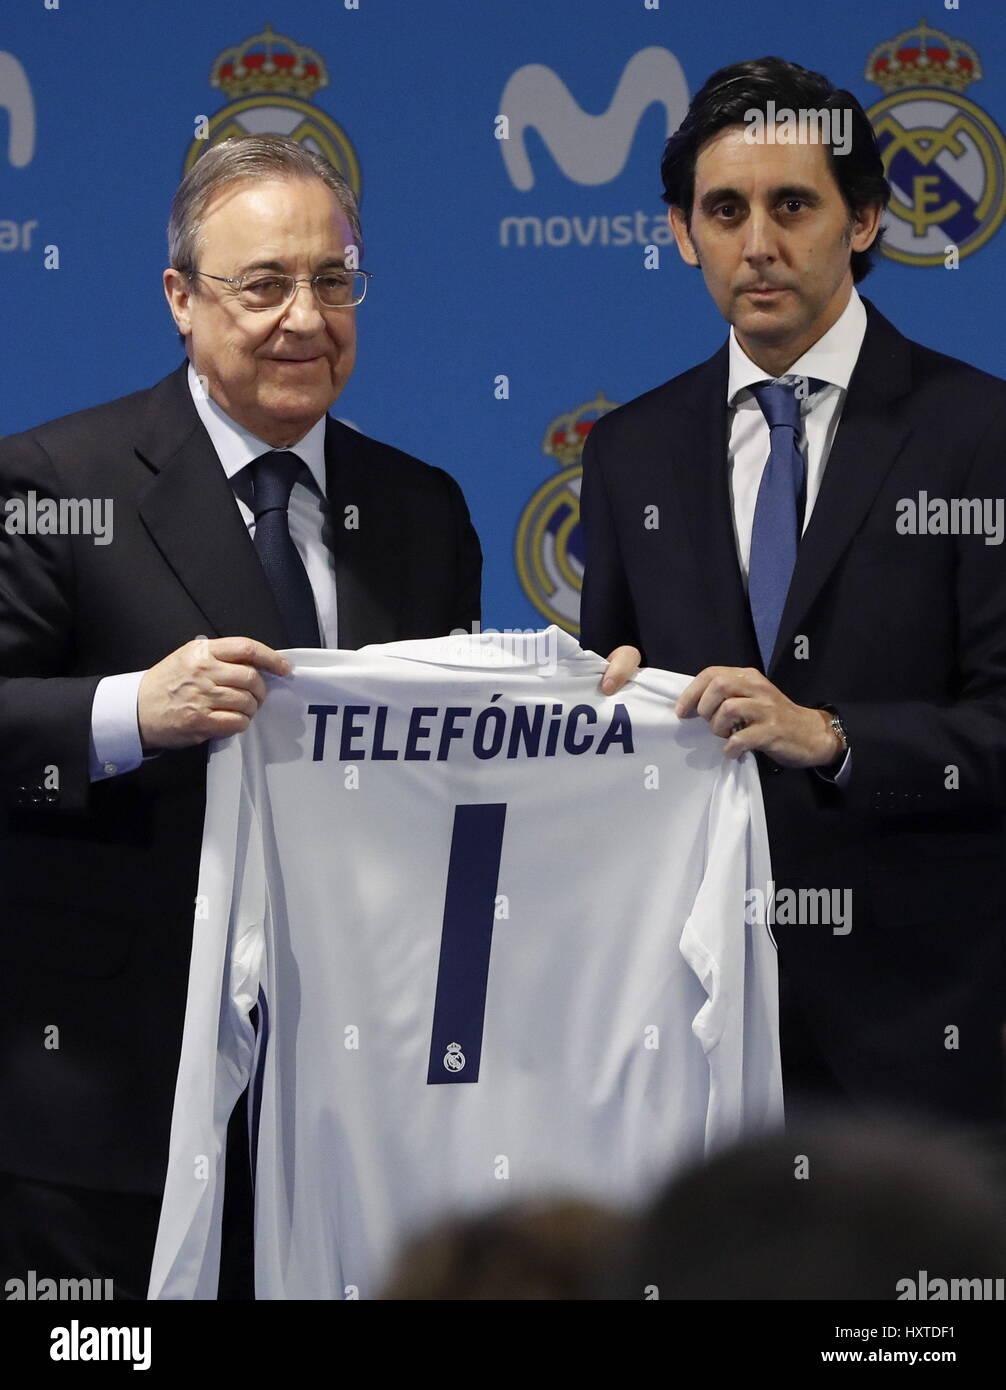 Real Madrid's President, Florentino Perez (L), poses with the President of Telefonica, Jose Maria Alvarez-Pallete, - Stock Image